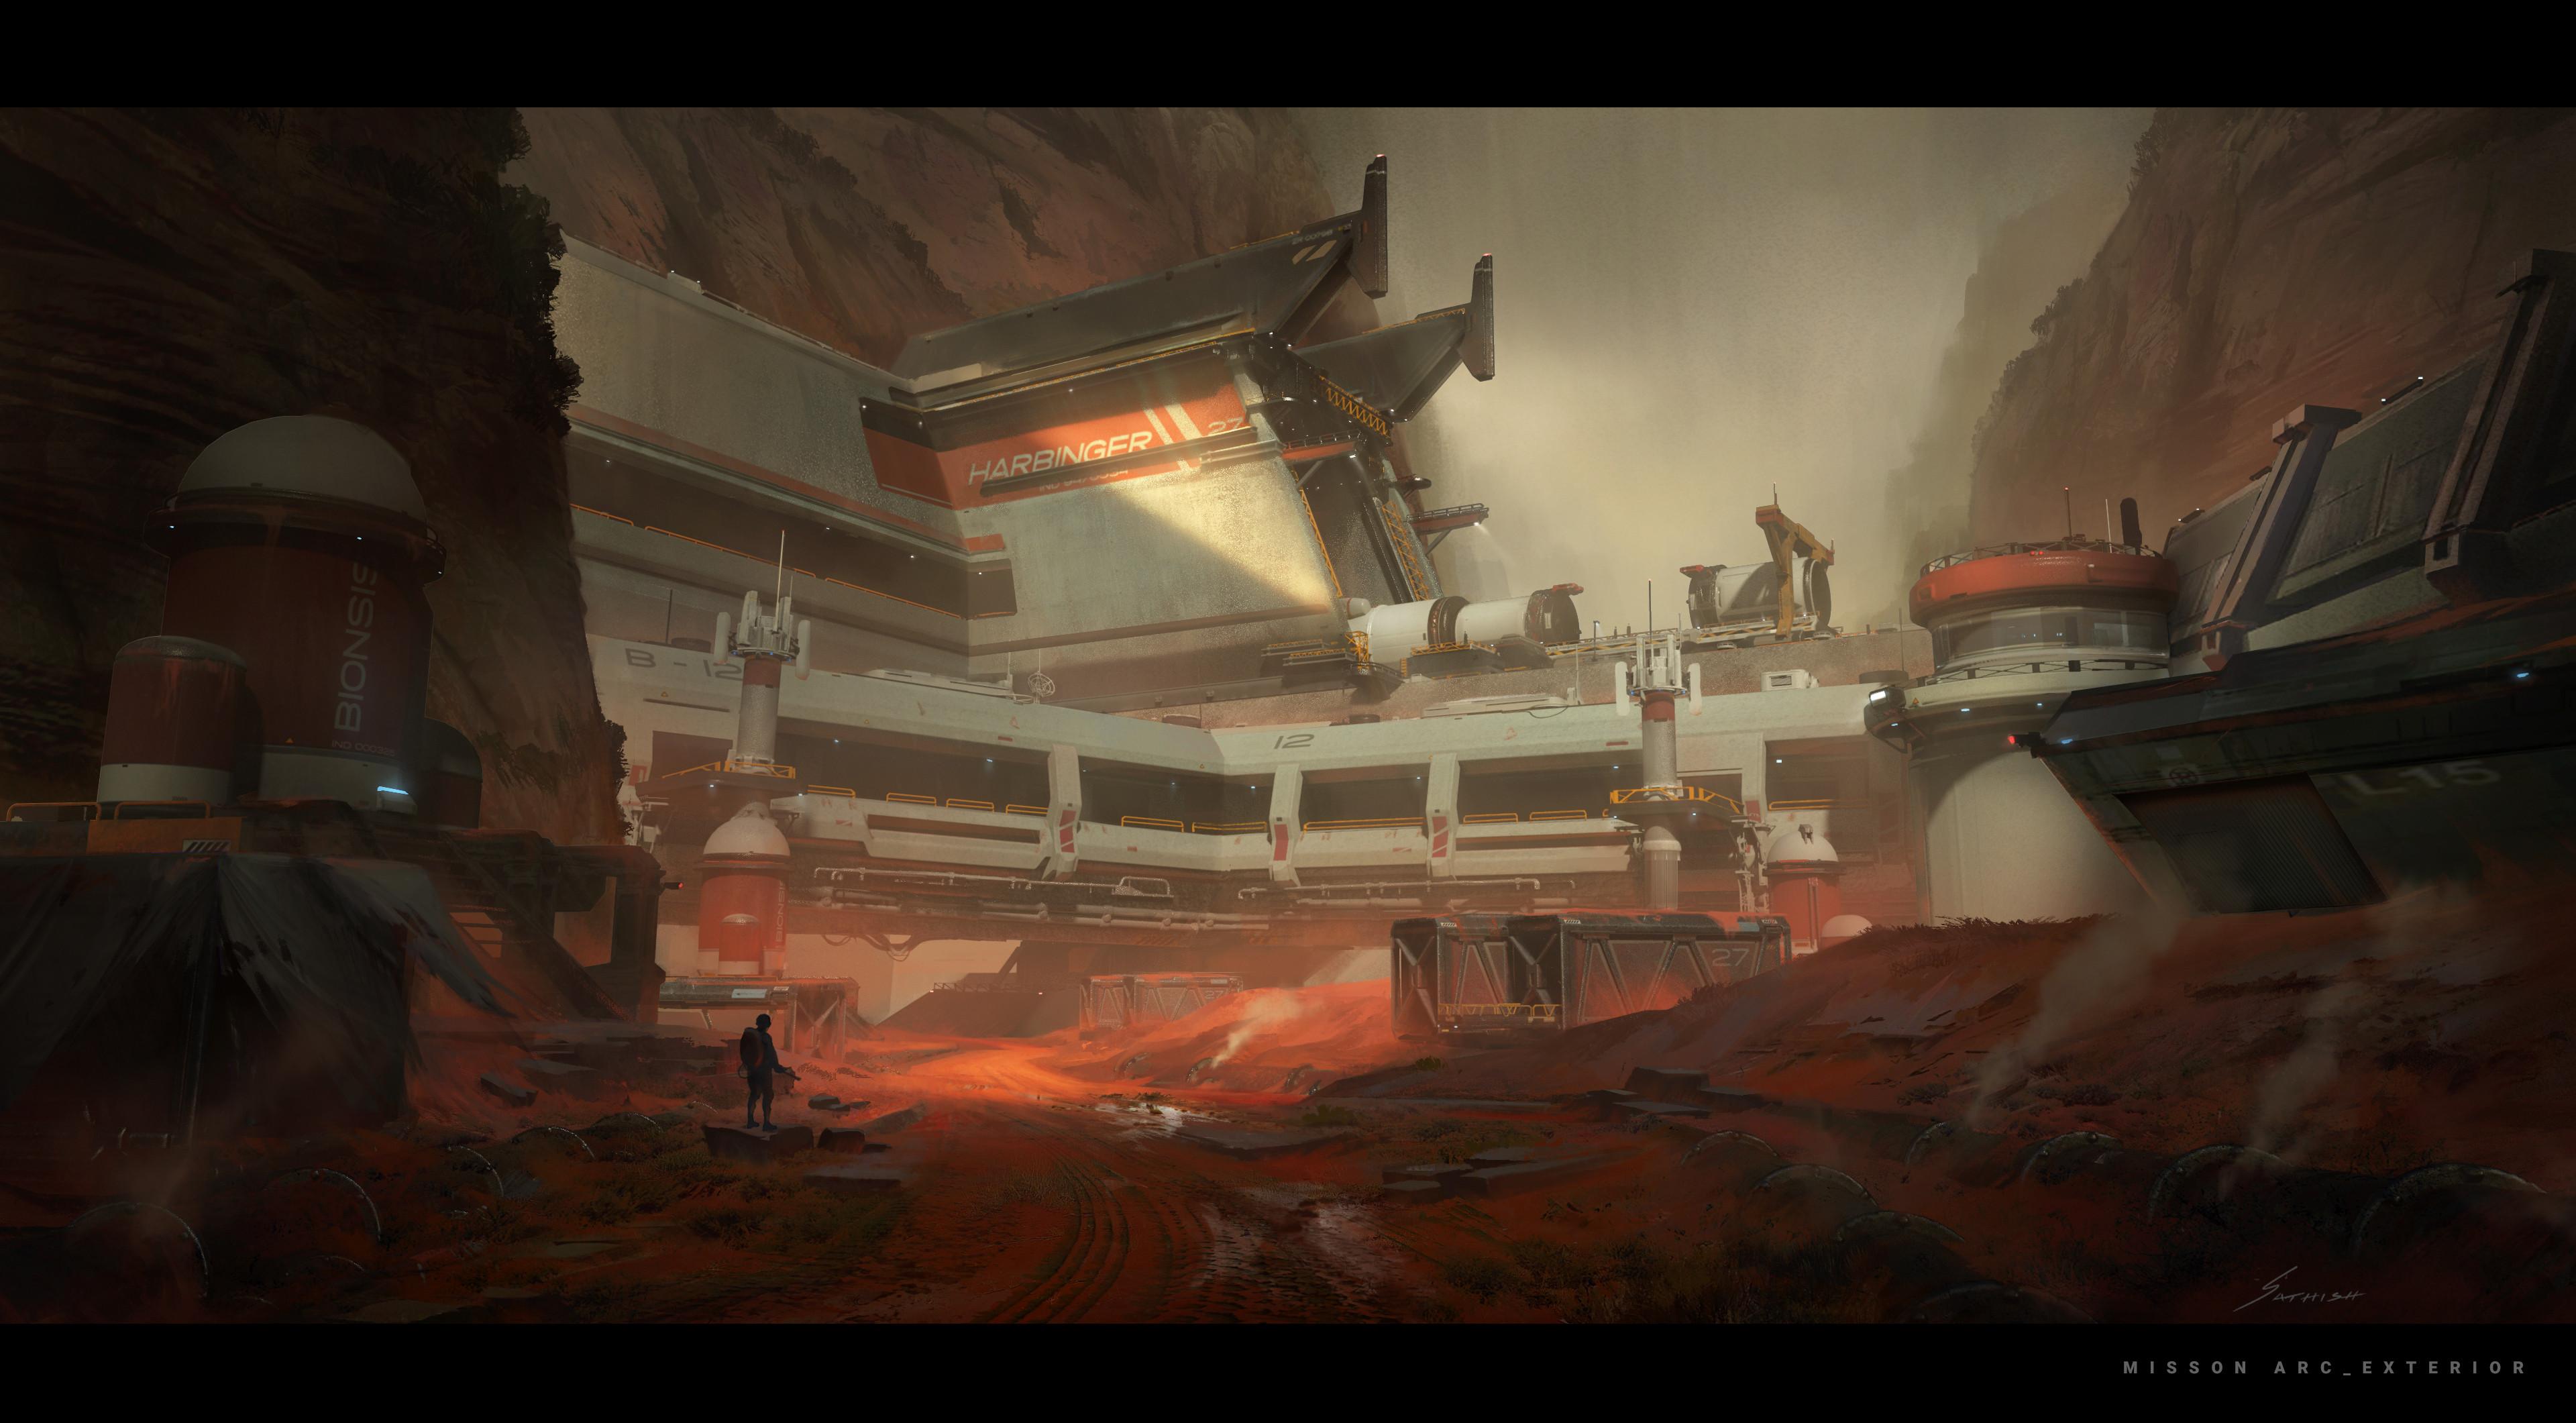 Mission Arc_Exterior Environment